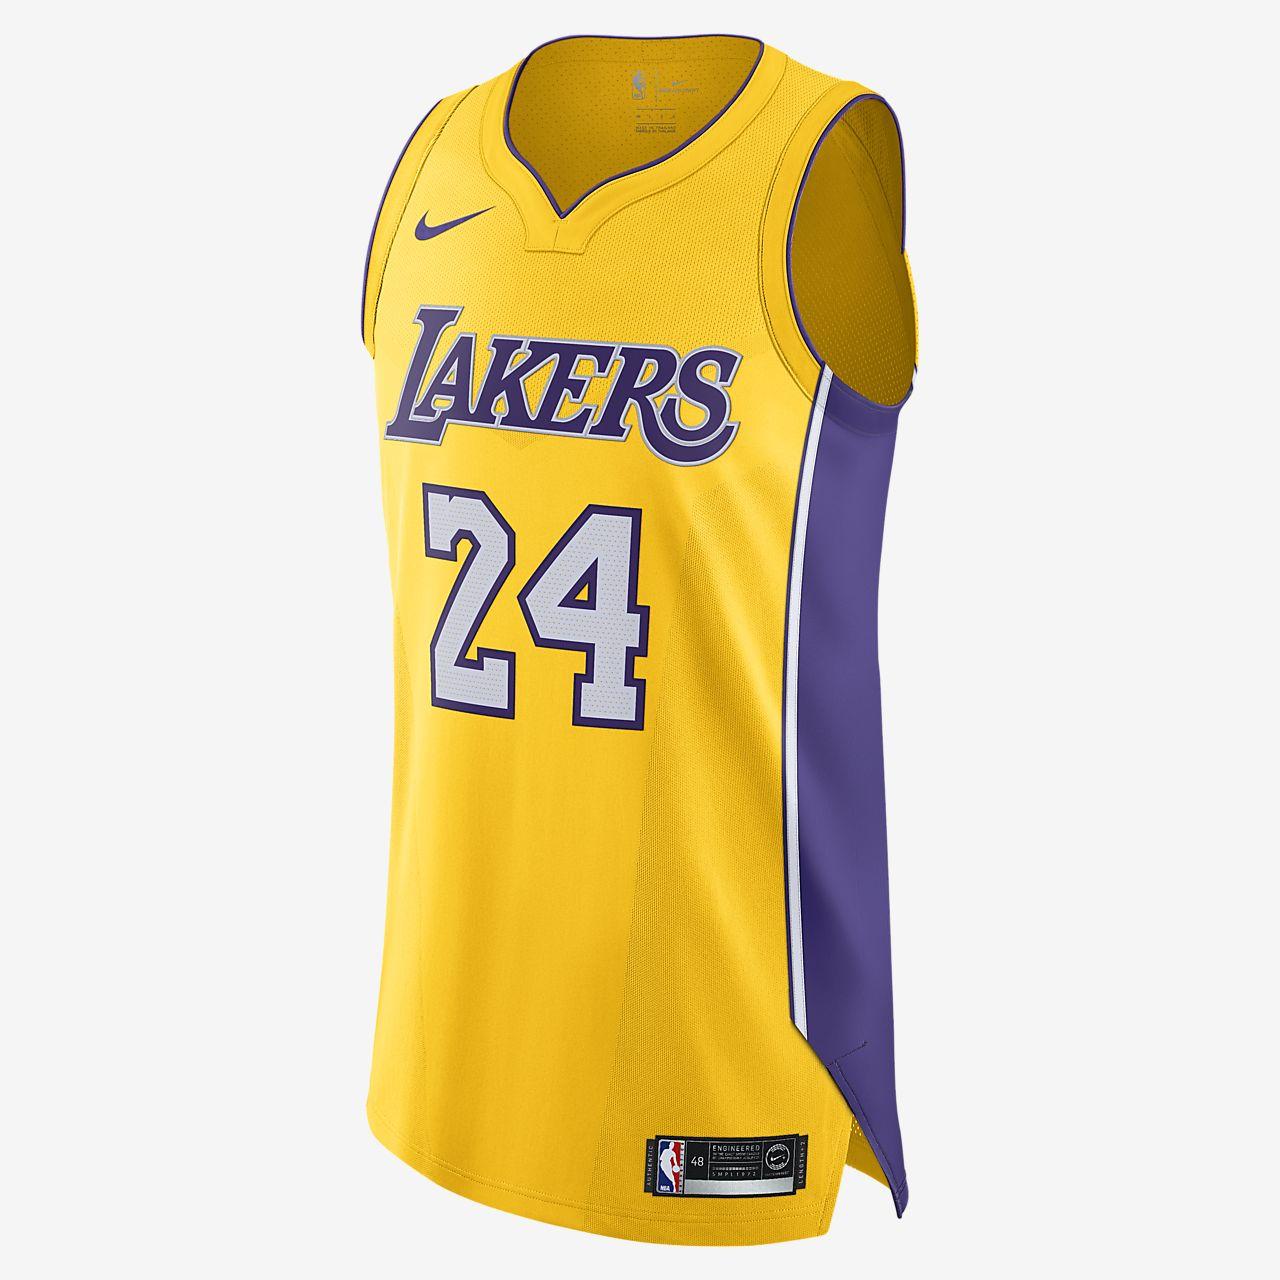 洛杉矶湖人队 (Kobe Bryant) Icon Edition Nike NBA Authentic Jersey 男子球衣